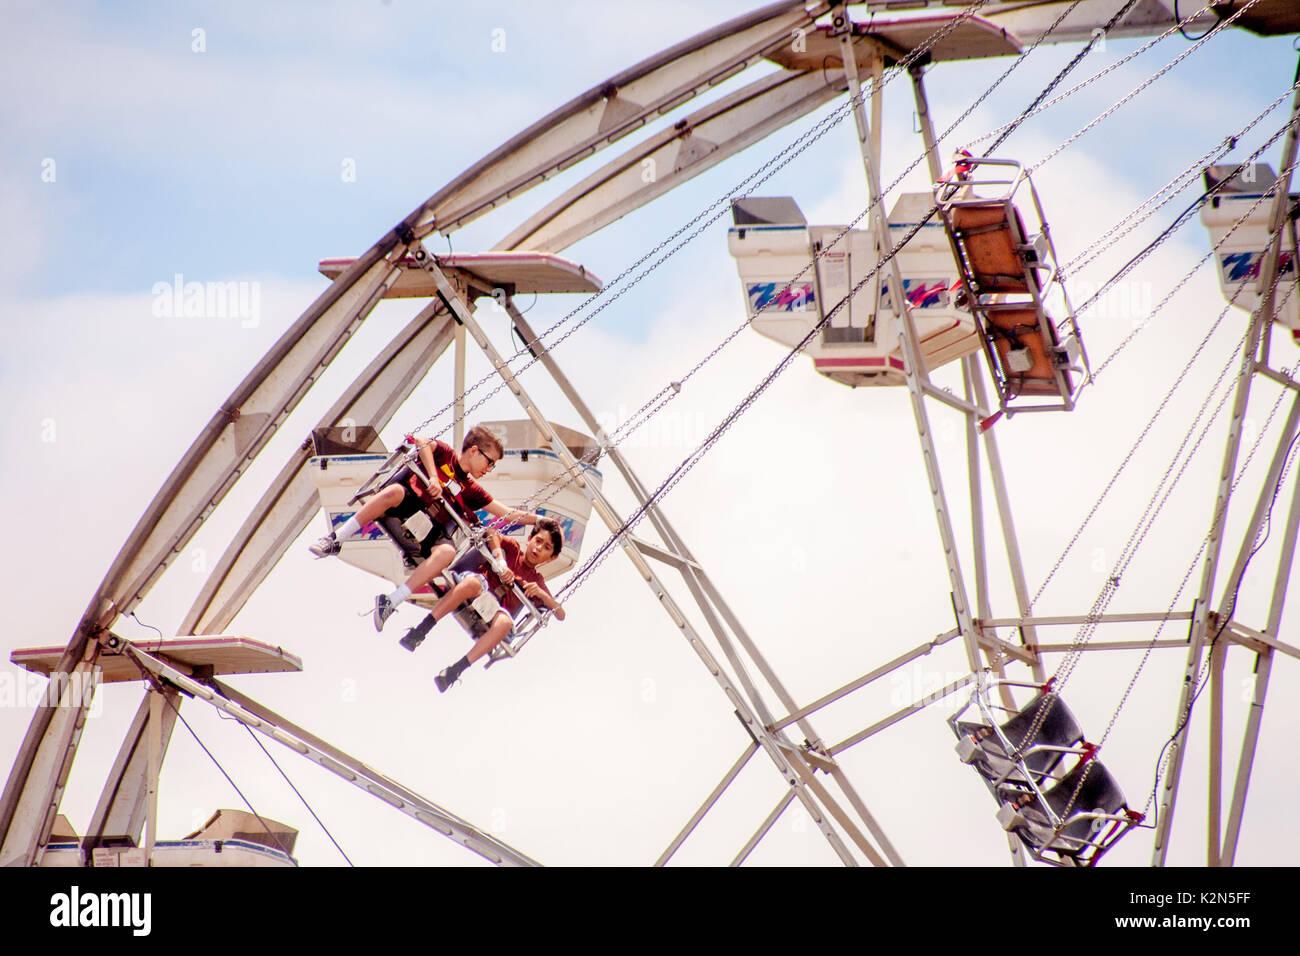 Boys on a 'Vertigo' ride are juxtaposed with a Ferris wheel at a Costa Mesa, CA, amusement park. - Stock Image